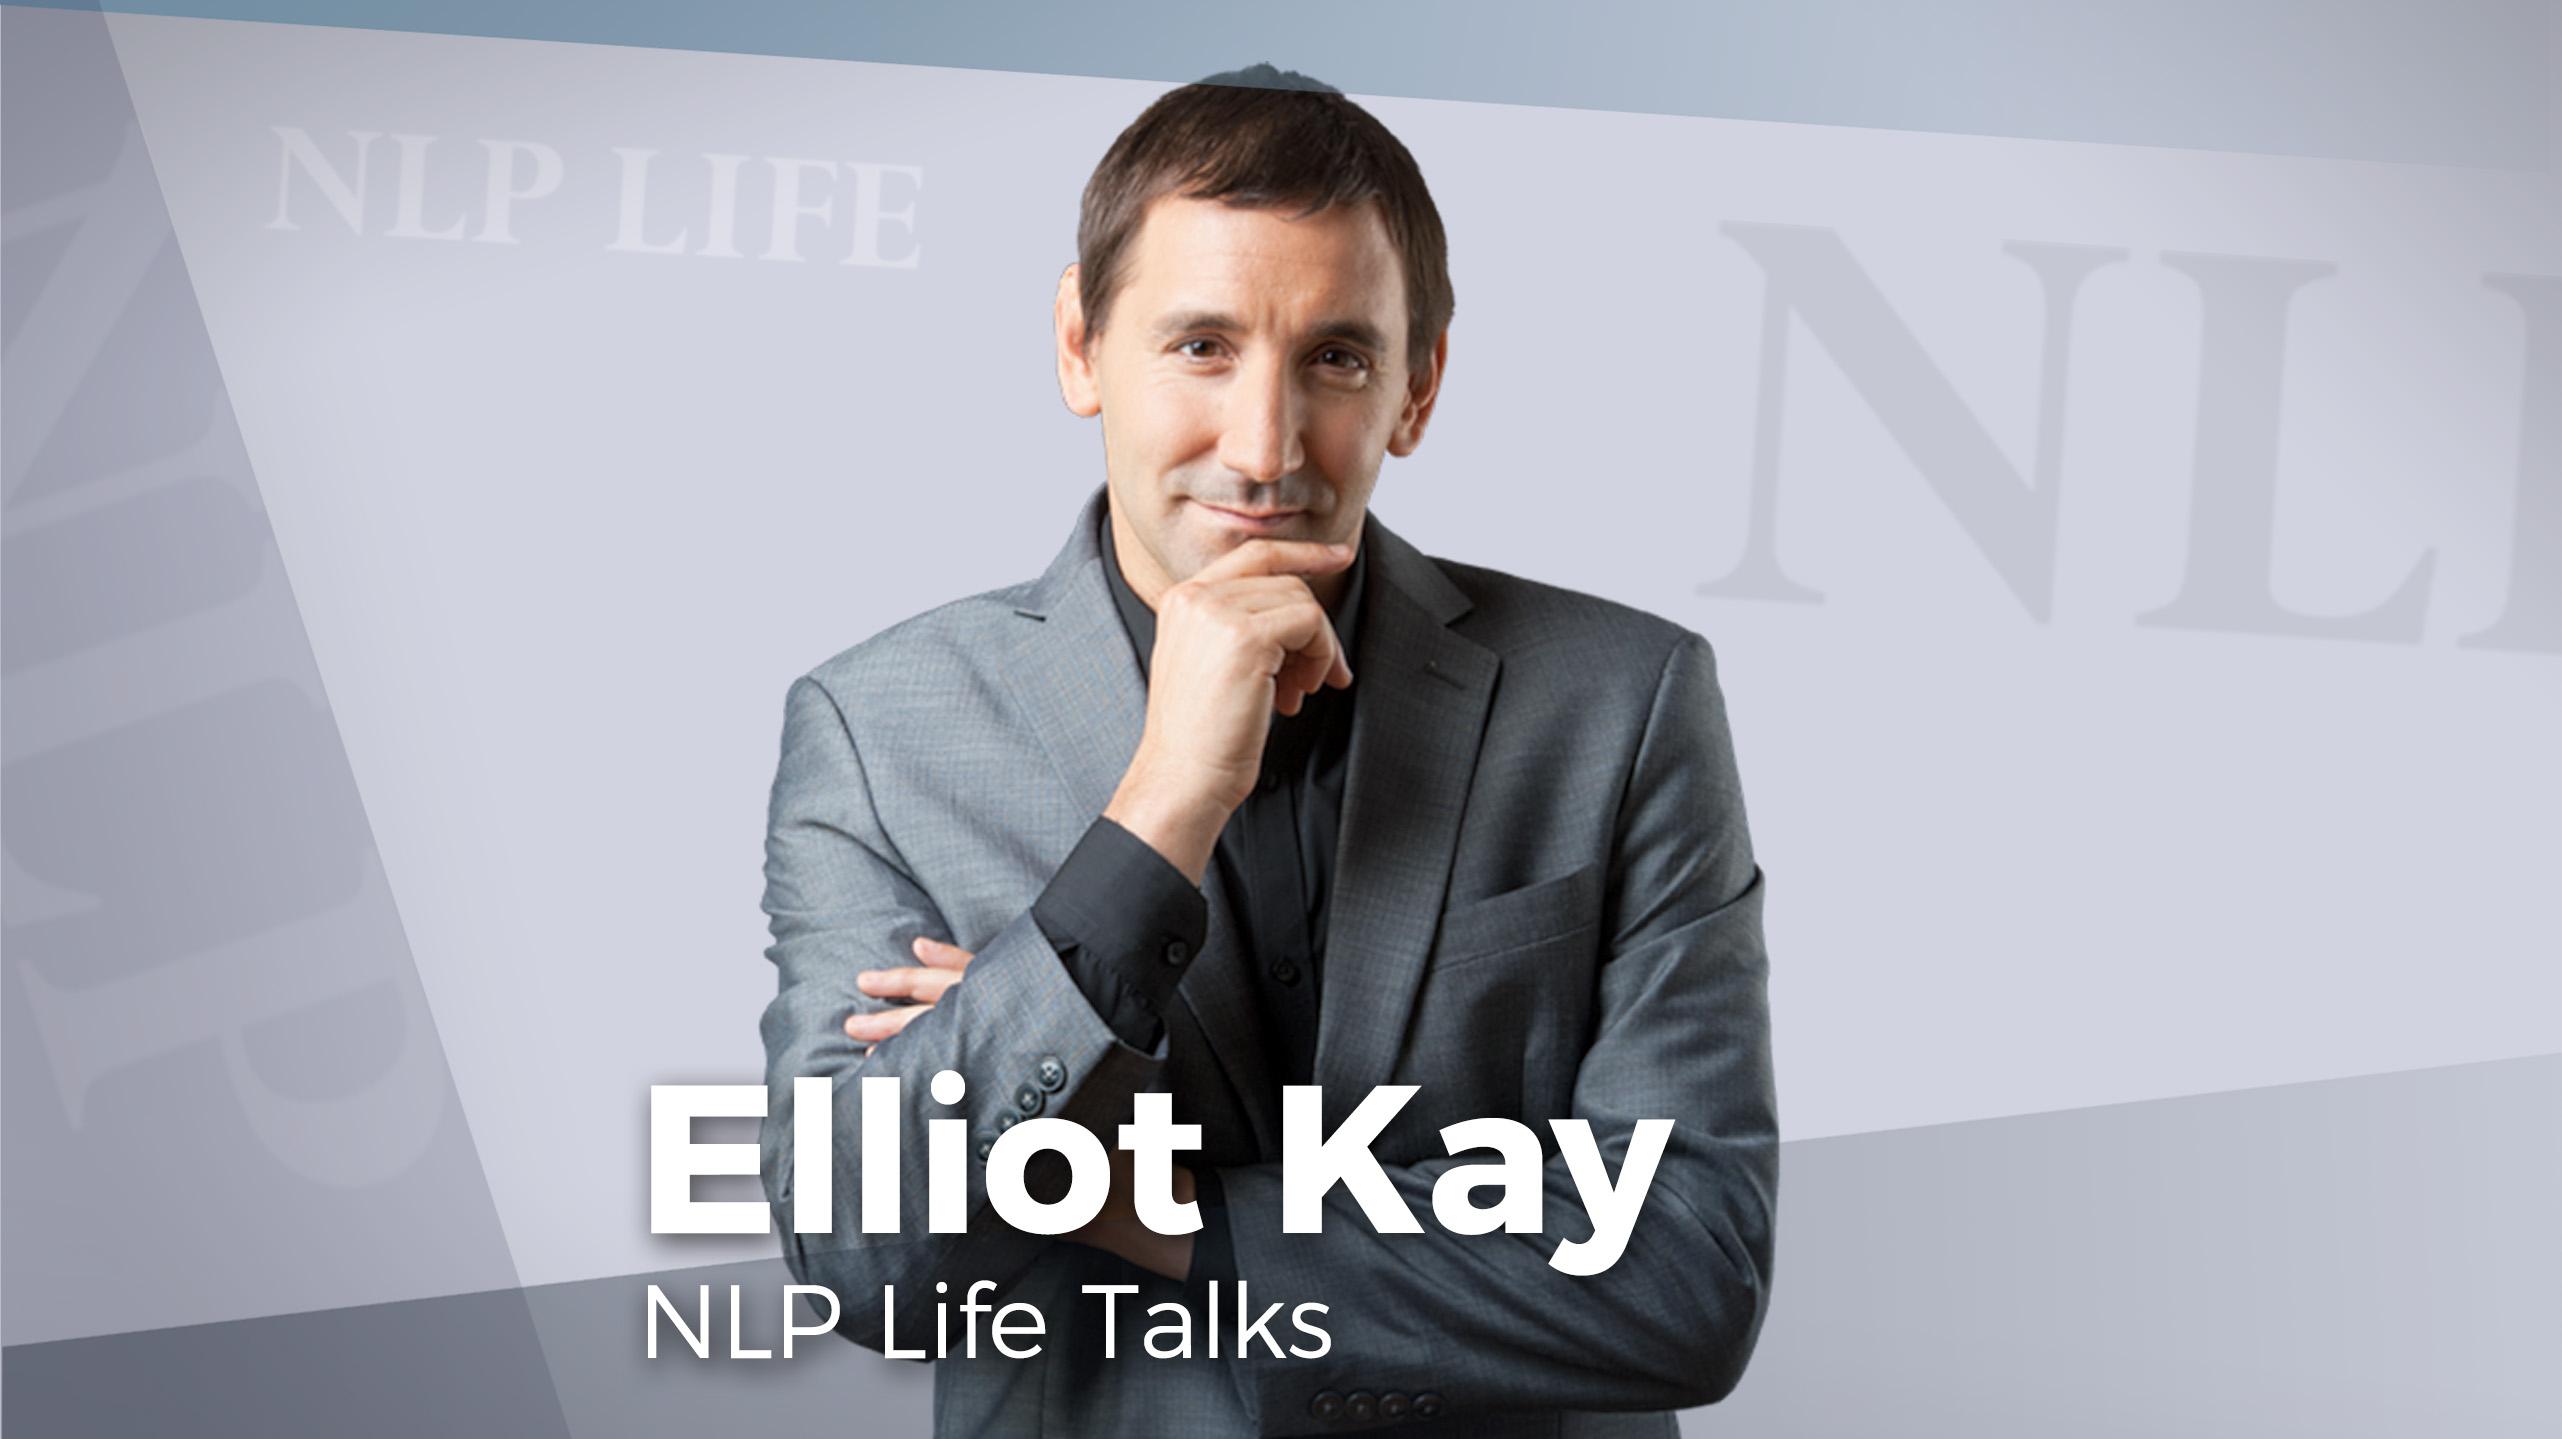 Elliot Kaye's NLP Life Talk